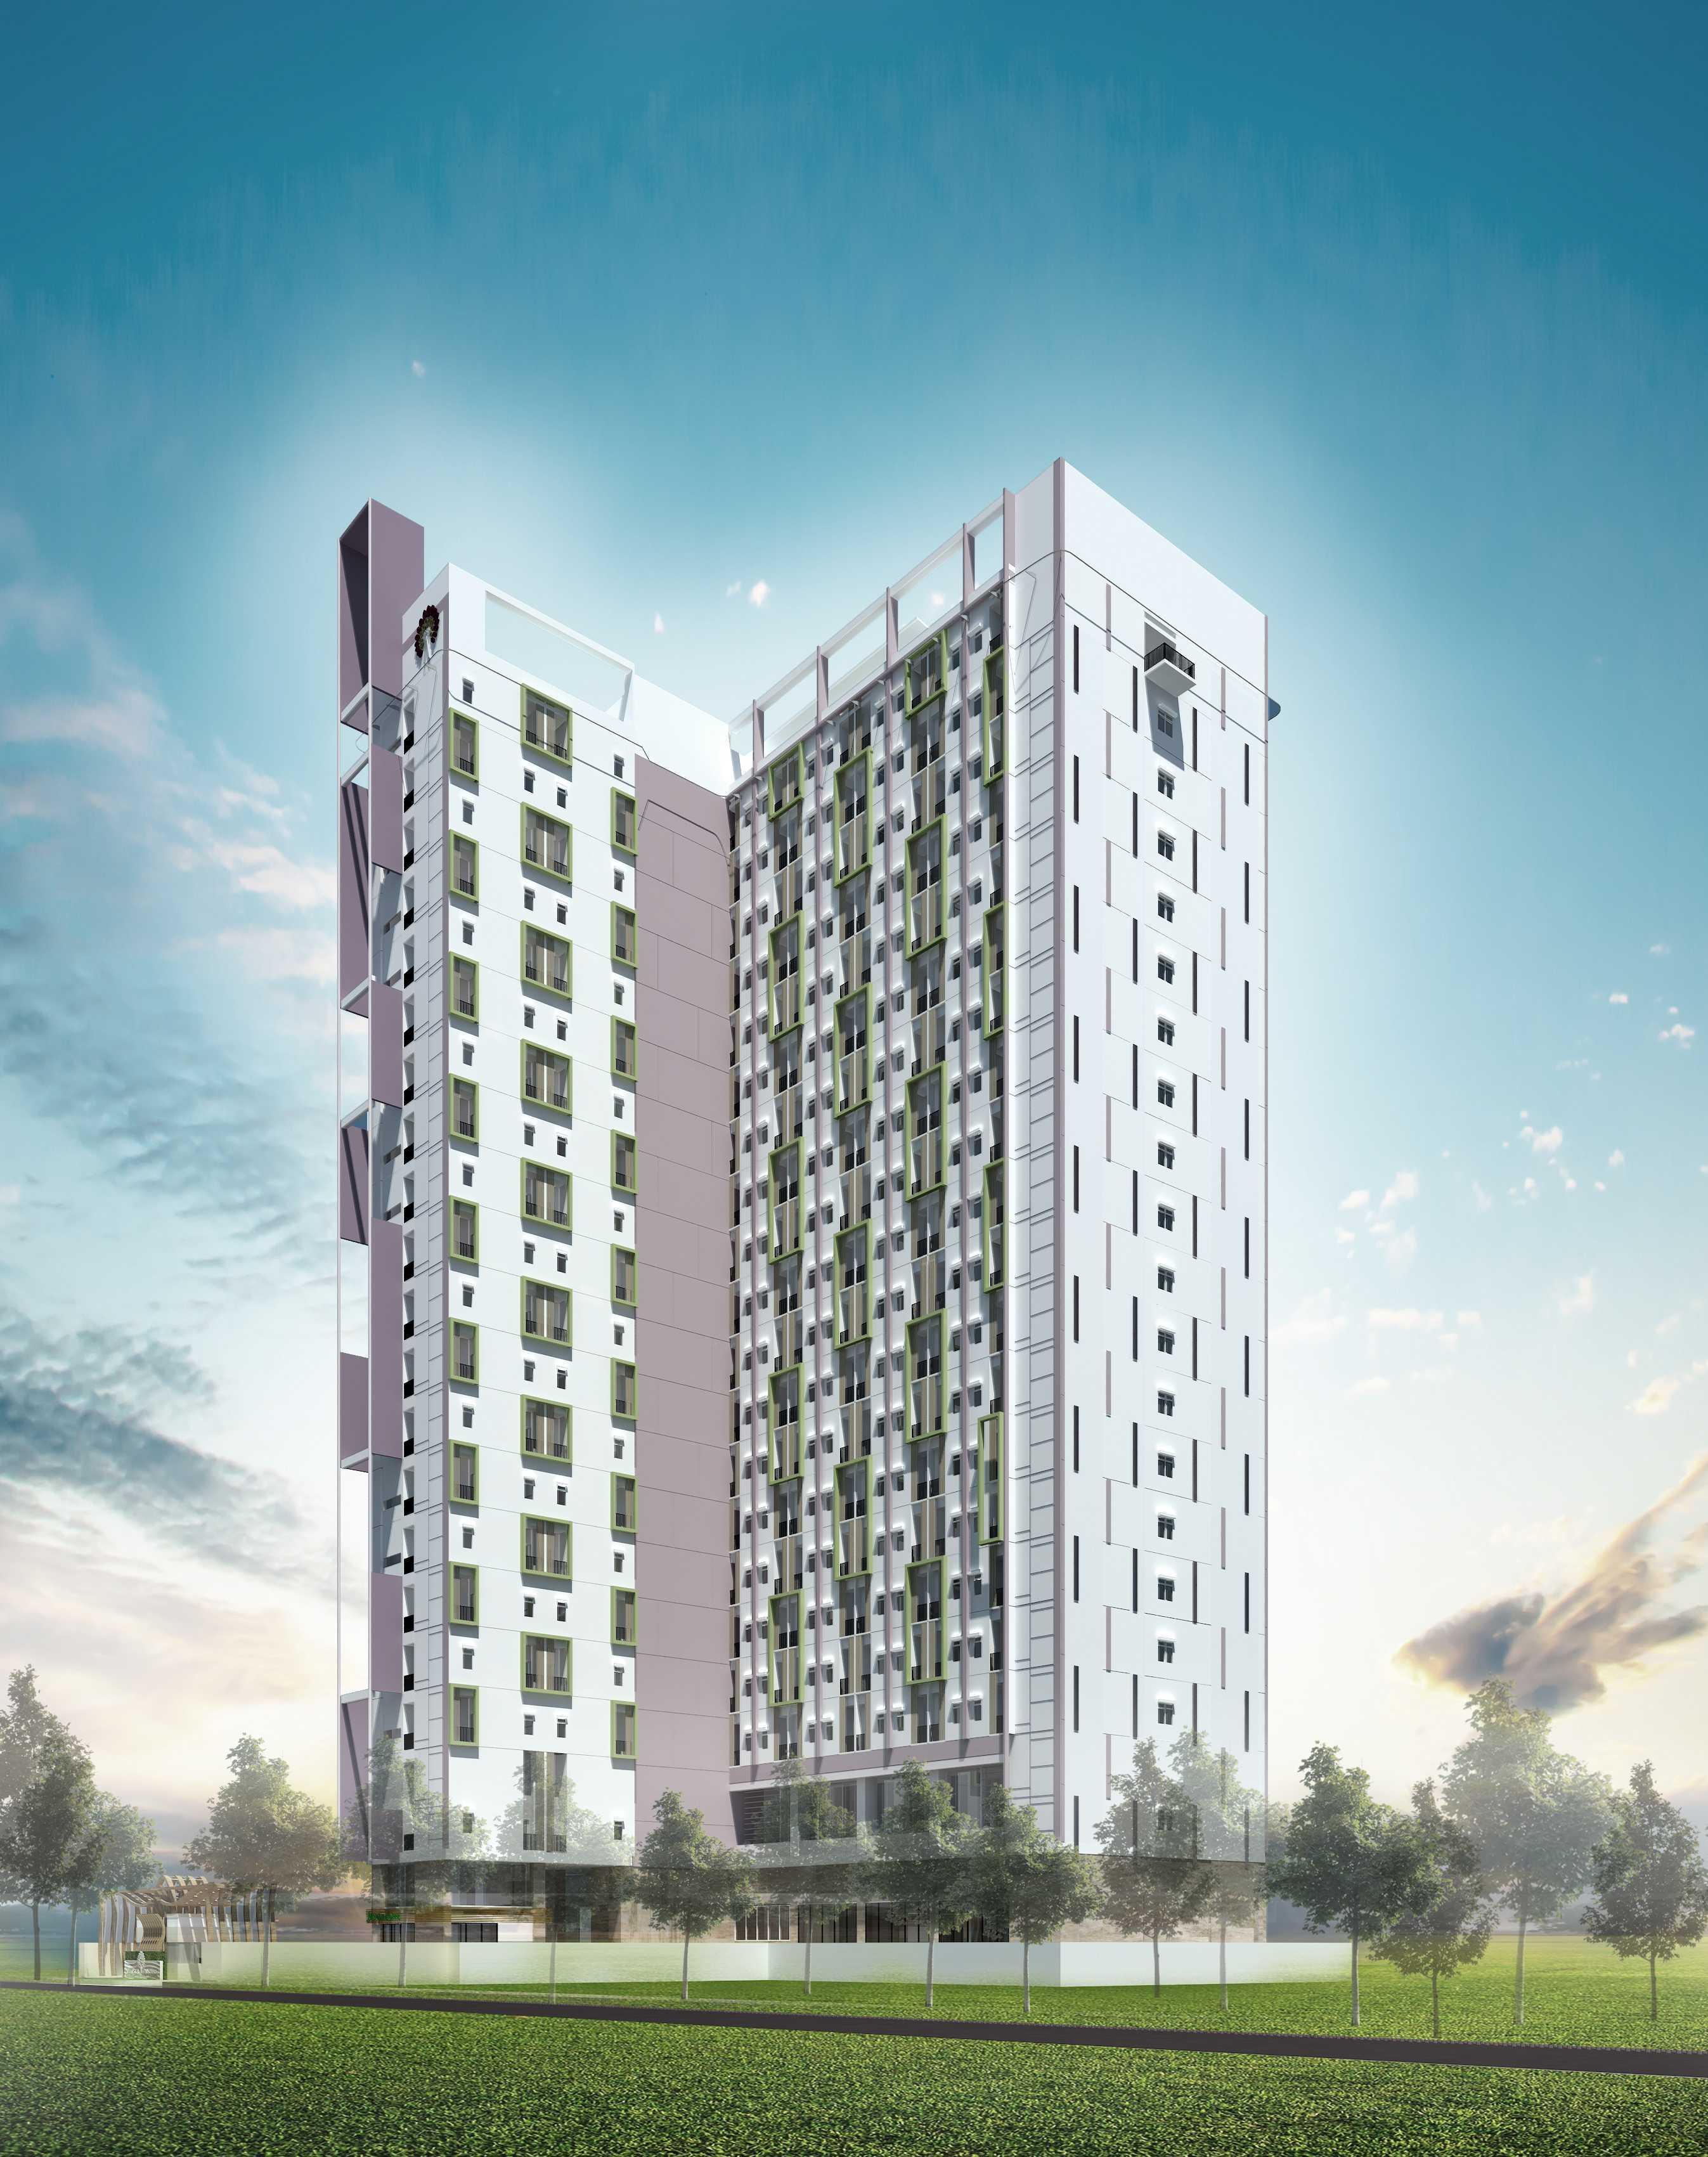 Pt Alradista Desain Indonesia Depok Apartment Depok Depok New-Facade   11158